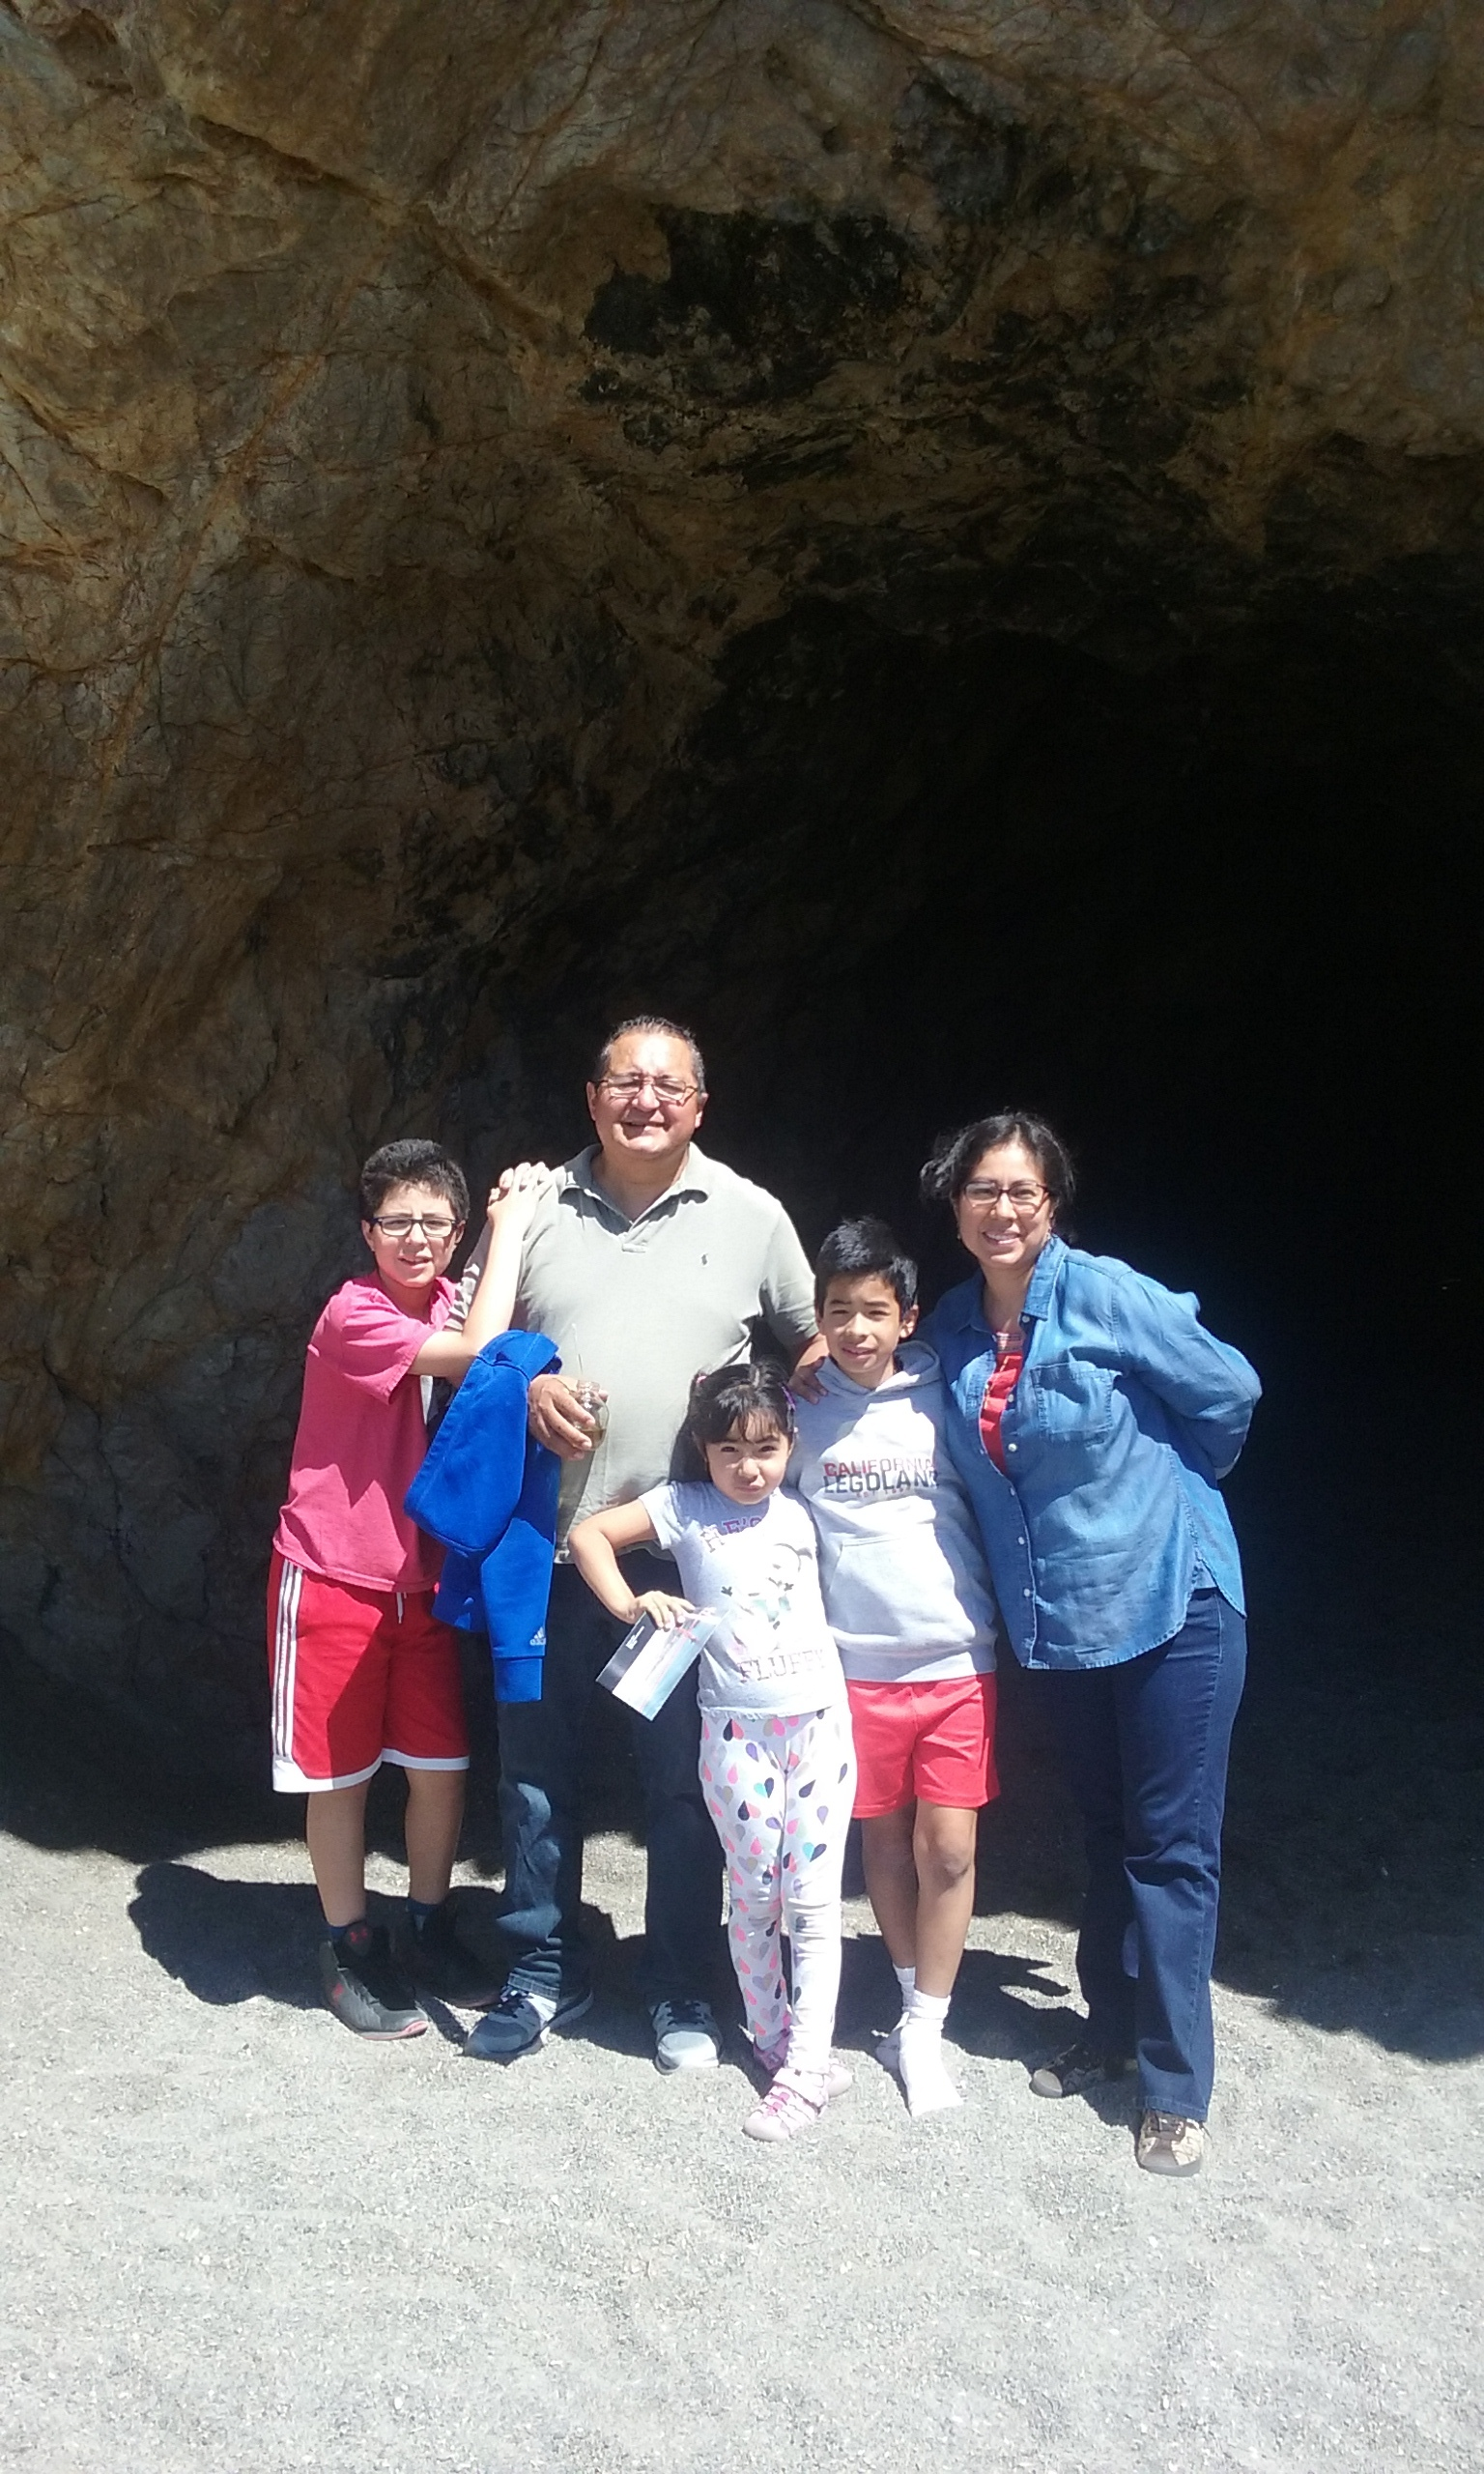 cajas-perea family.jpg